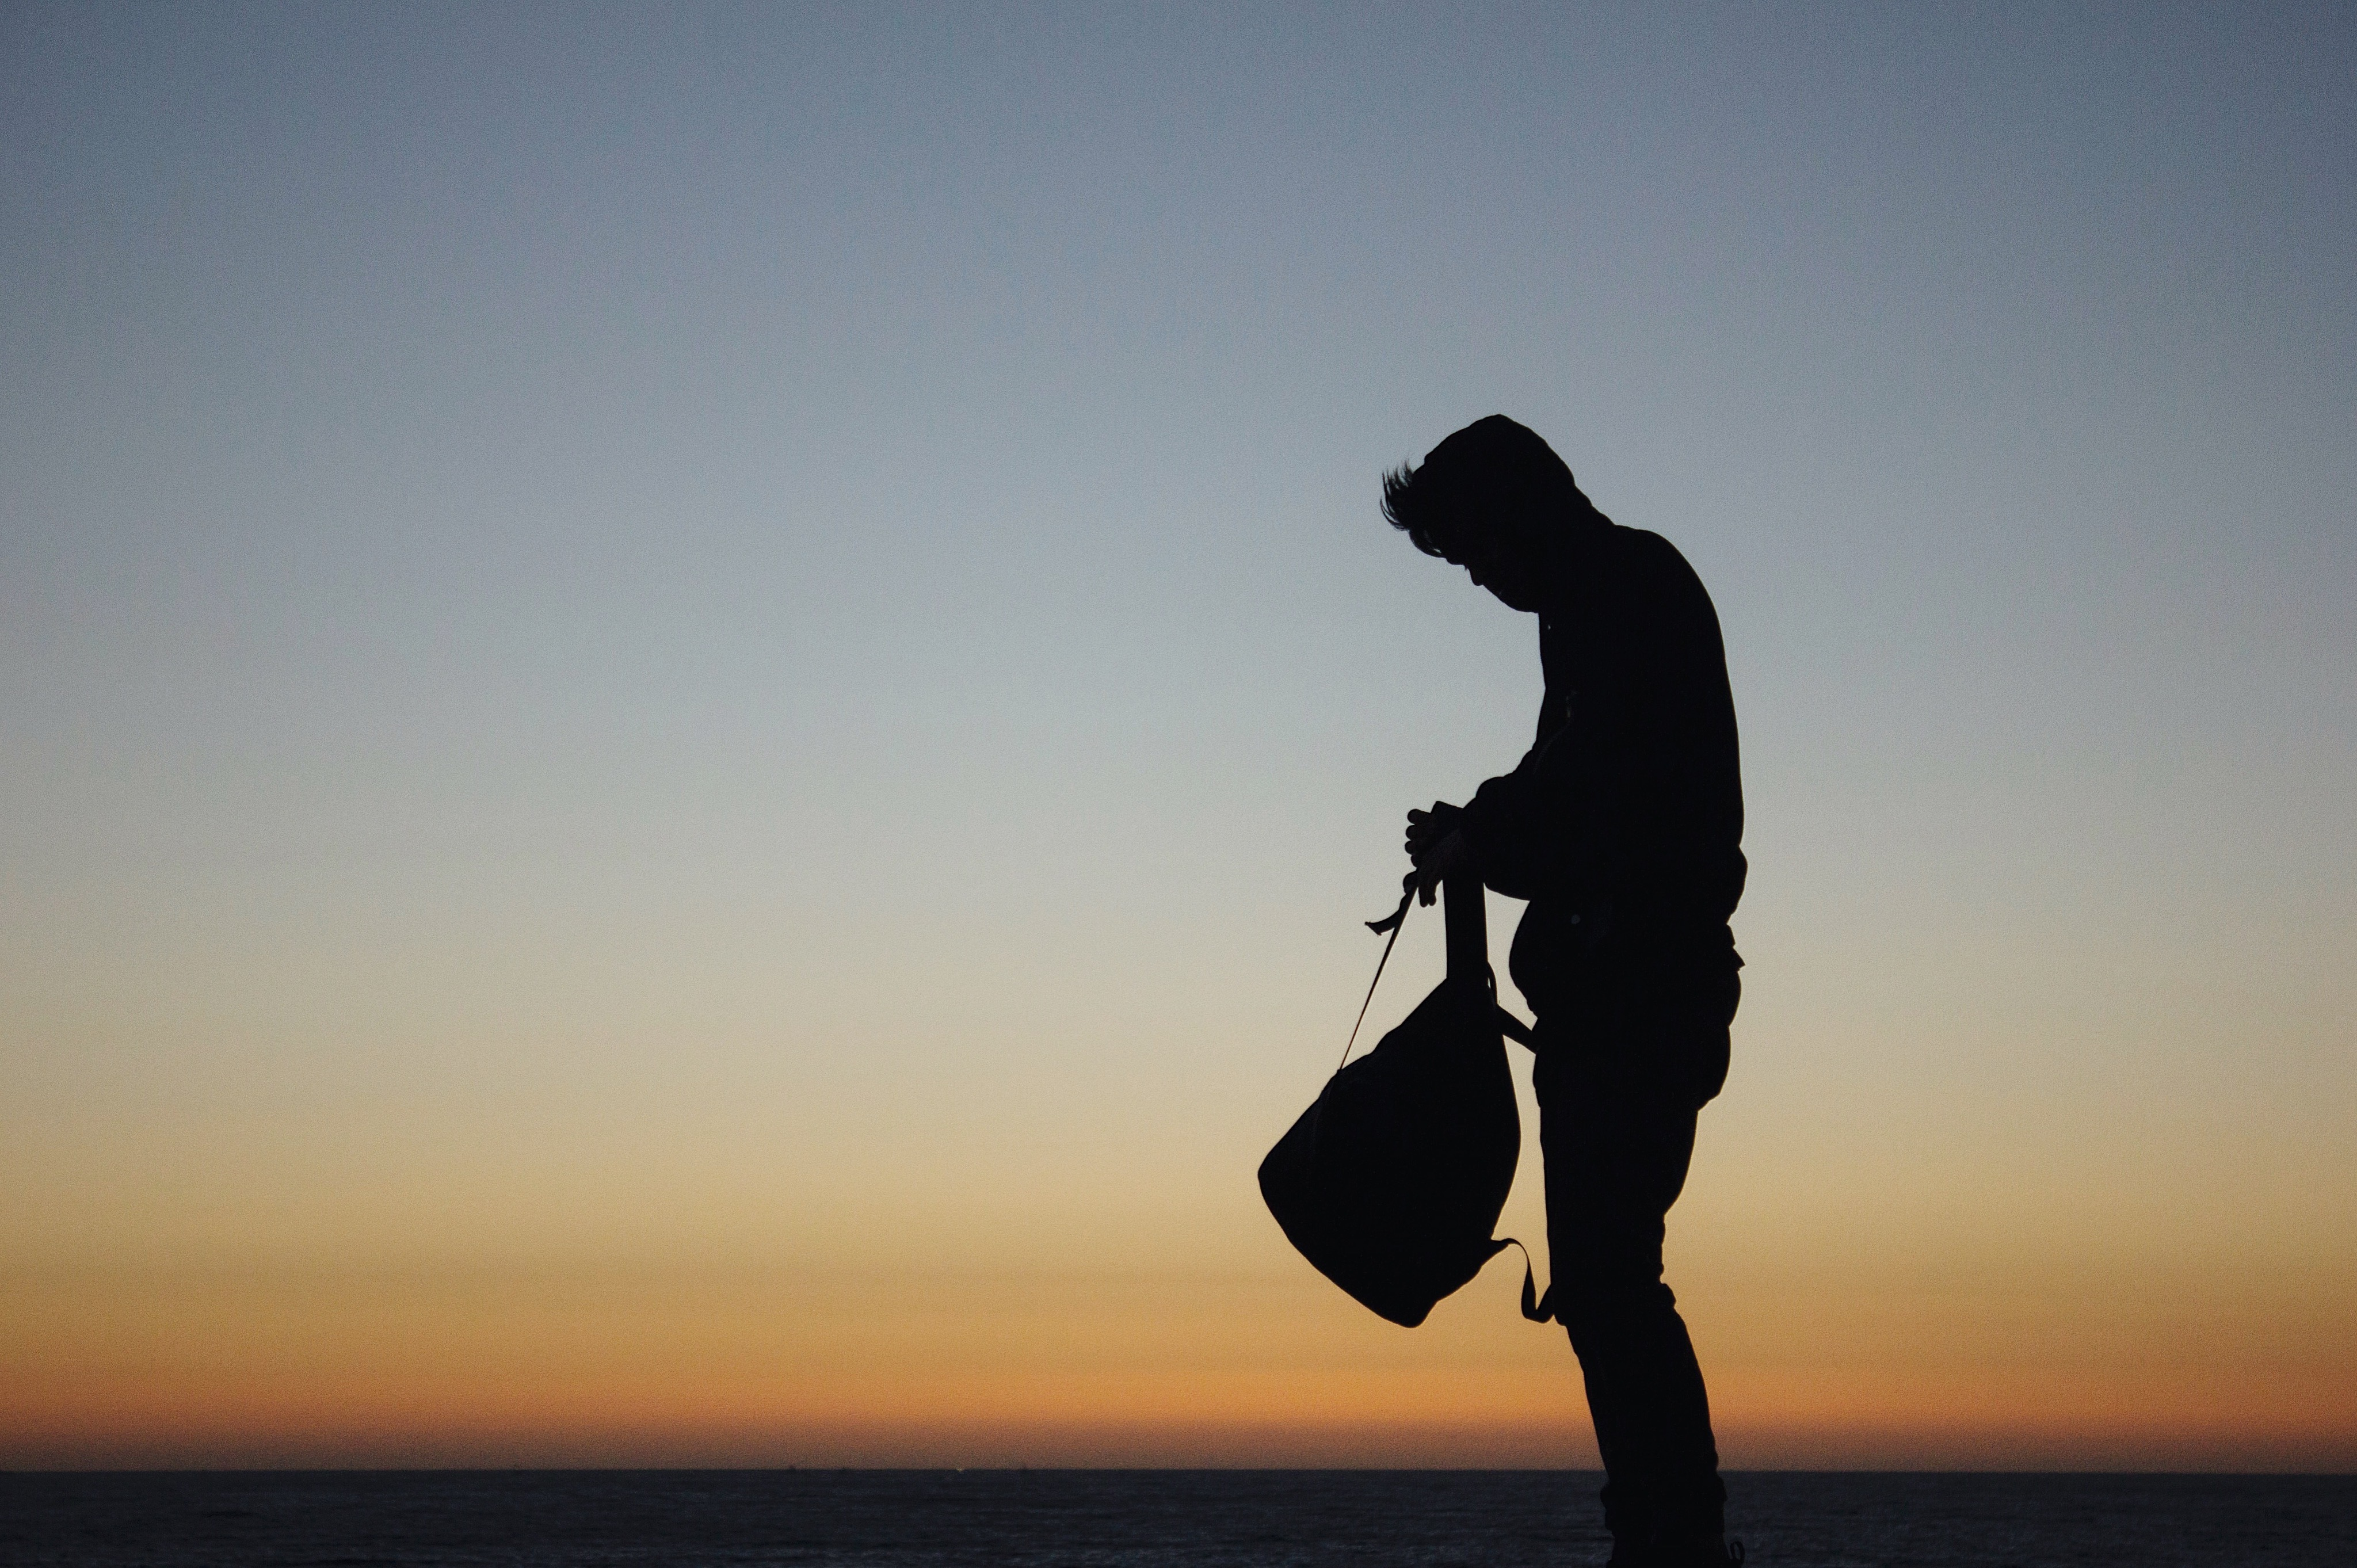 File:Backpacker at sunset (Unsplash).jpg - Wikimedia Commons